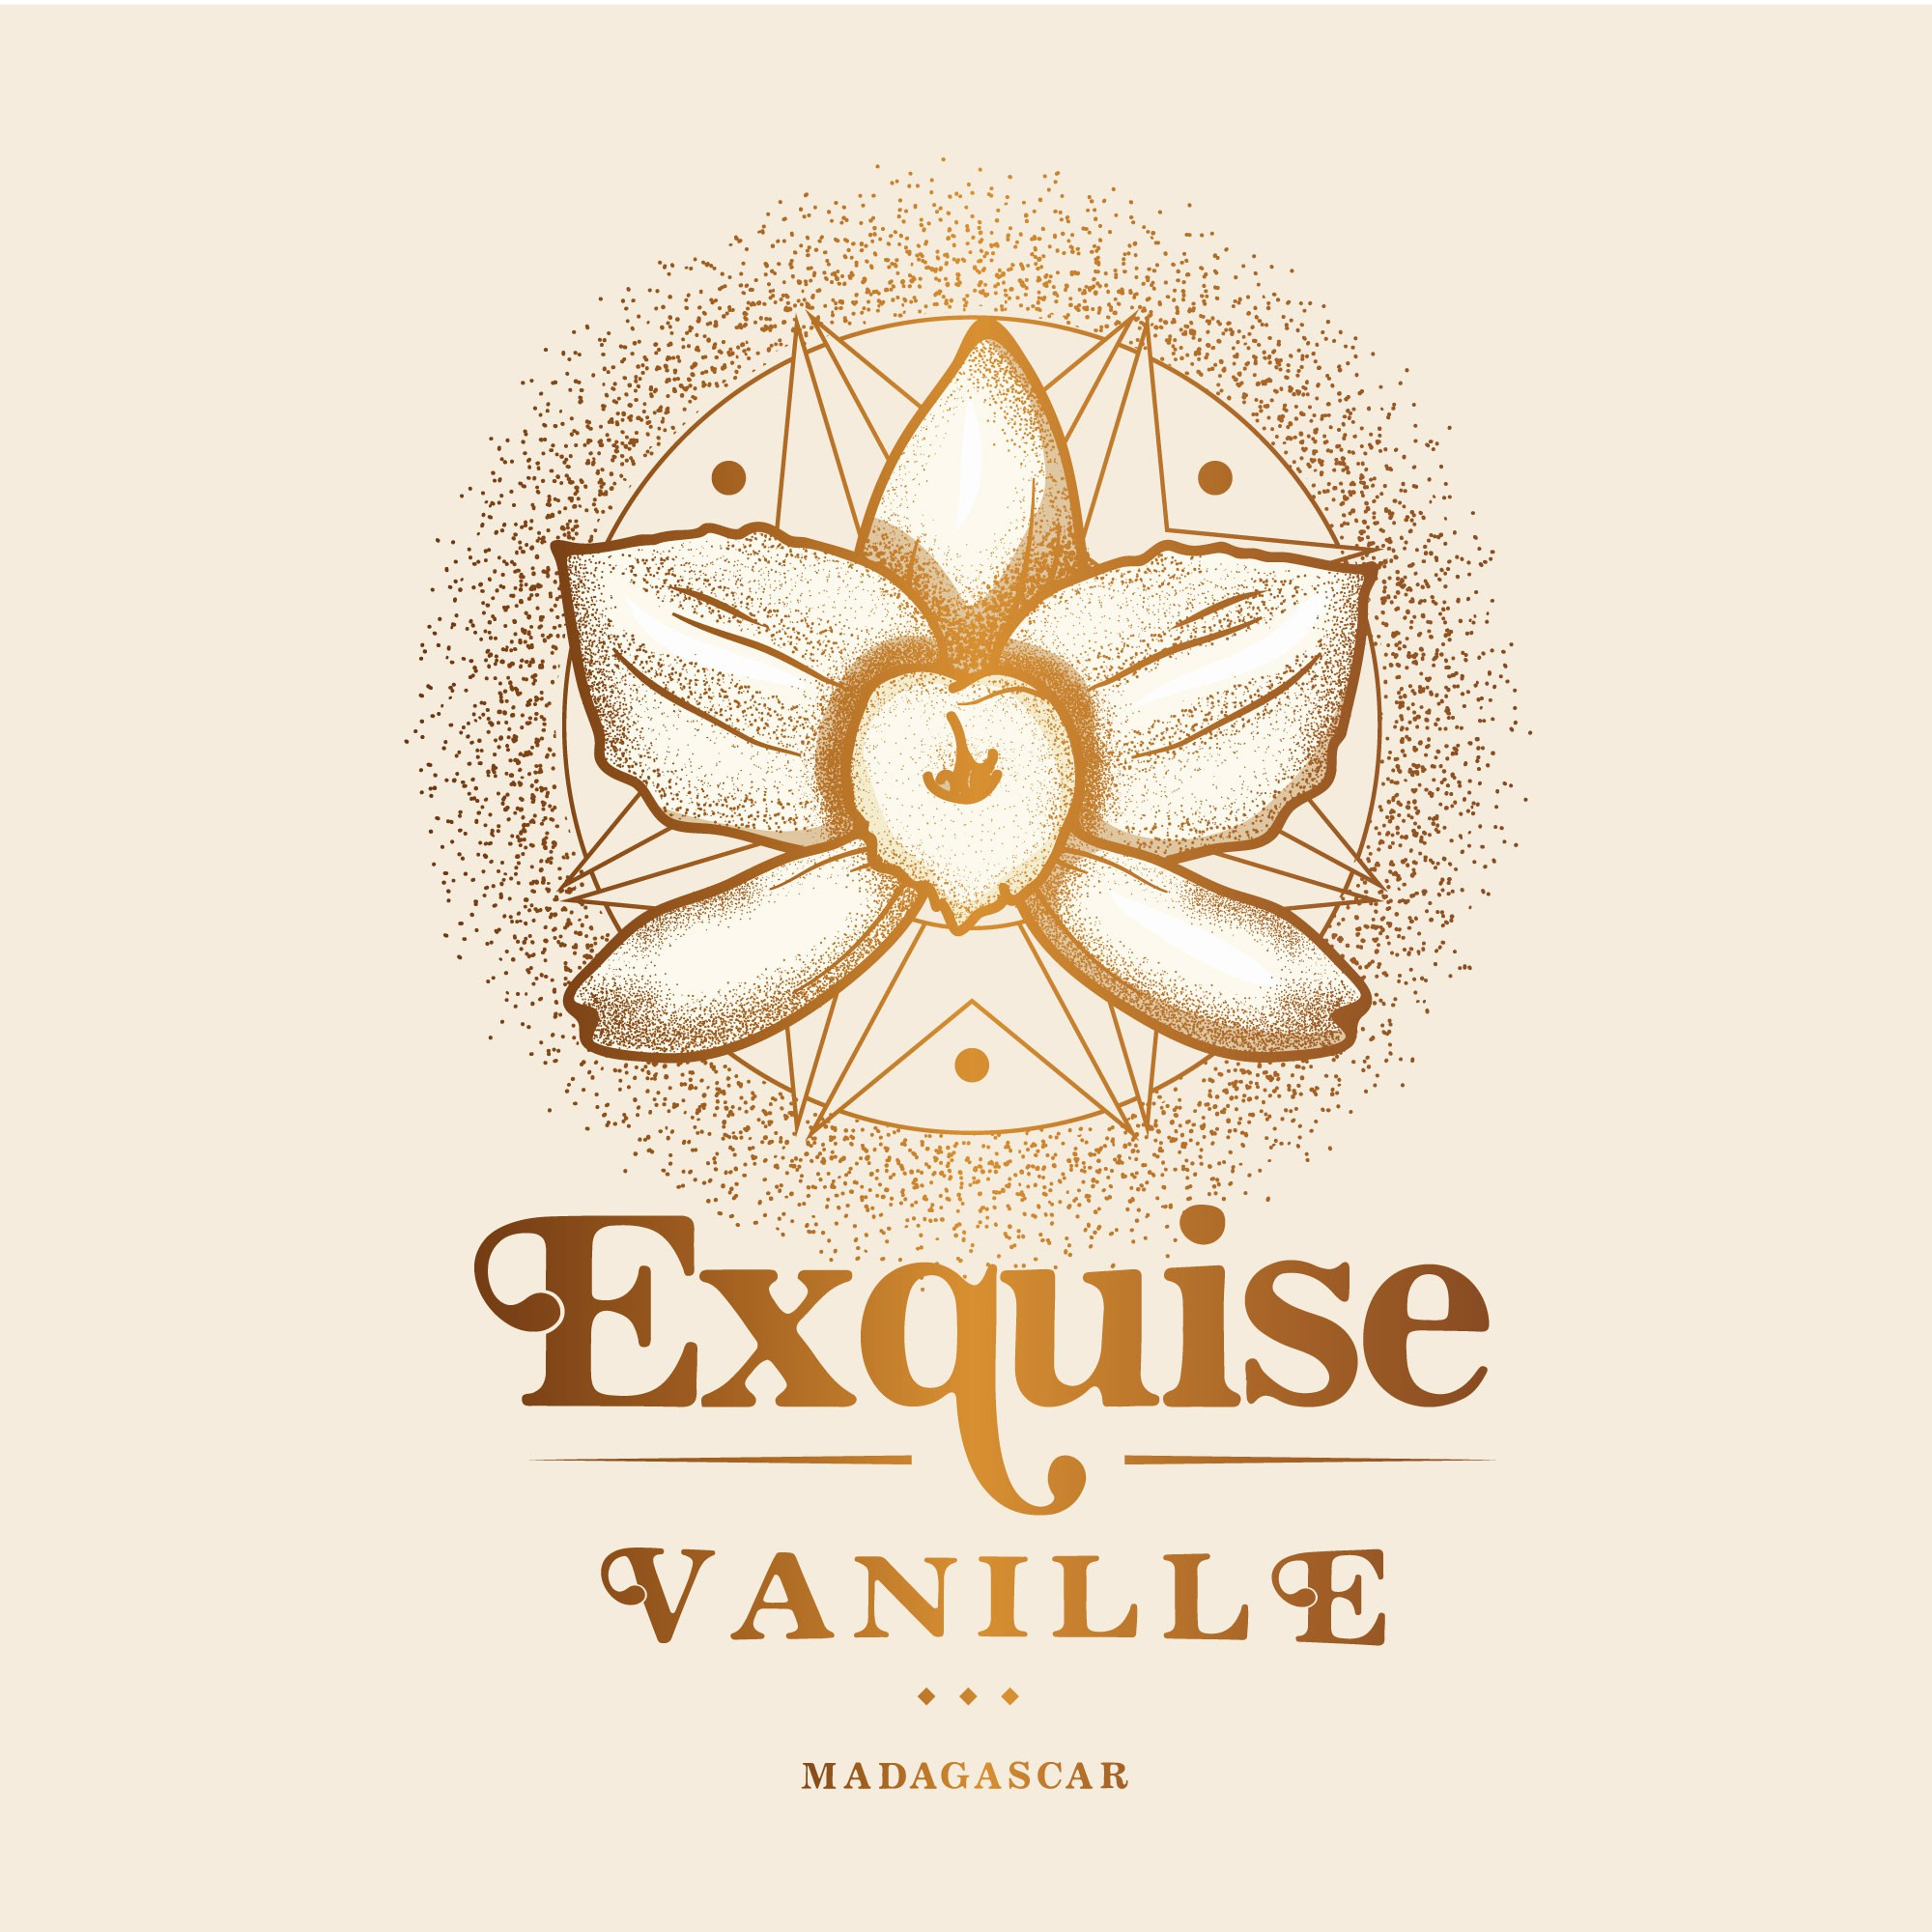 """Create a logo for premium vanilla"""